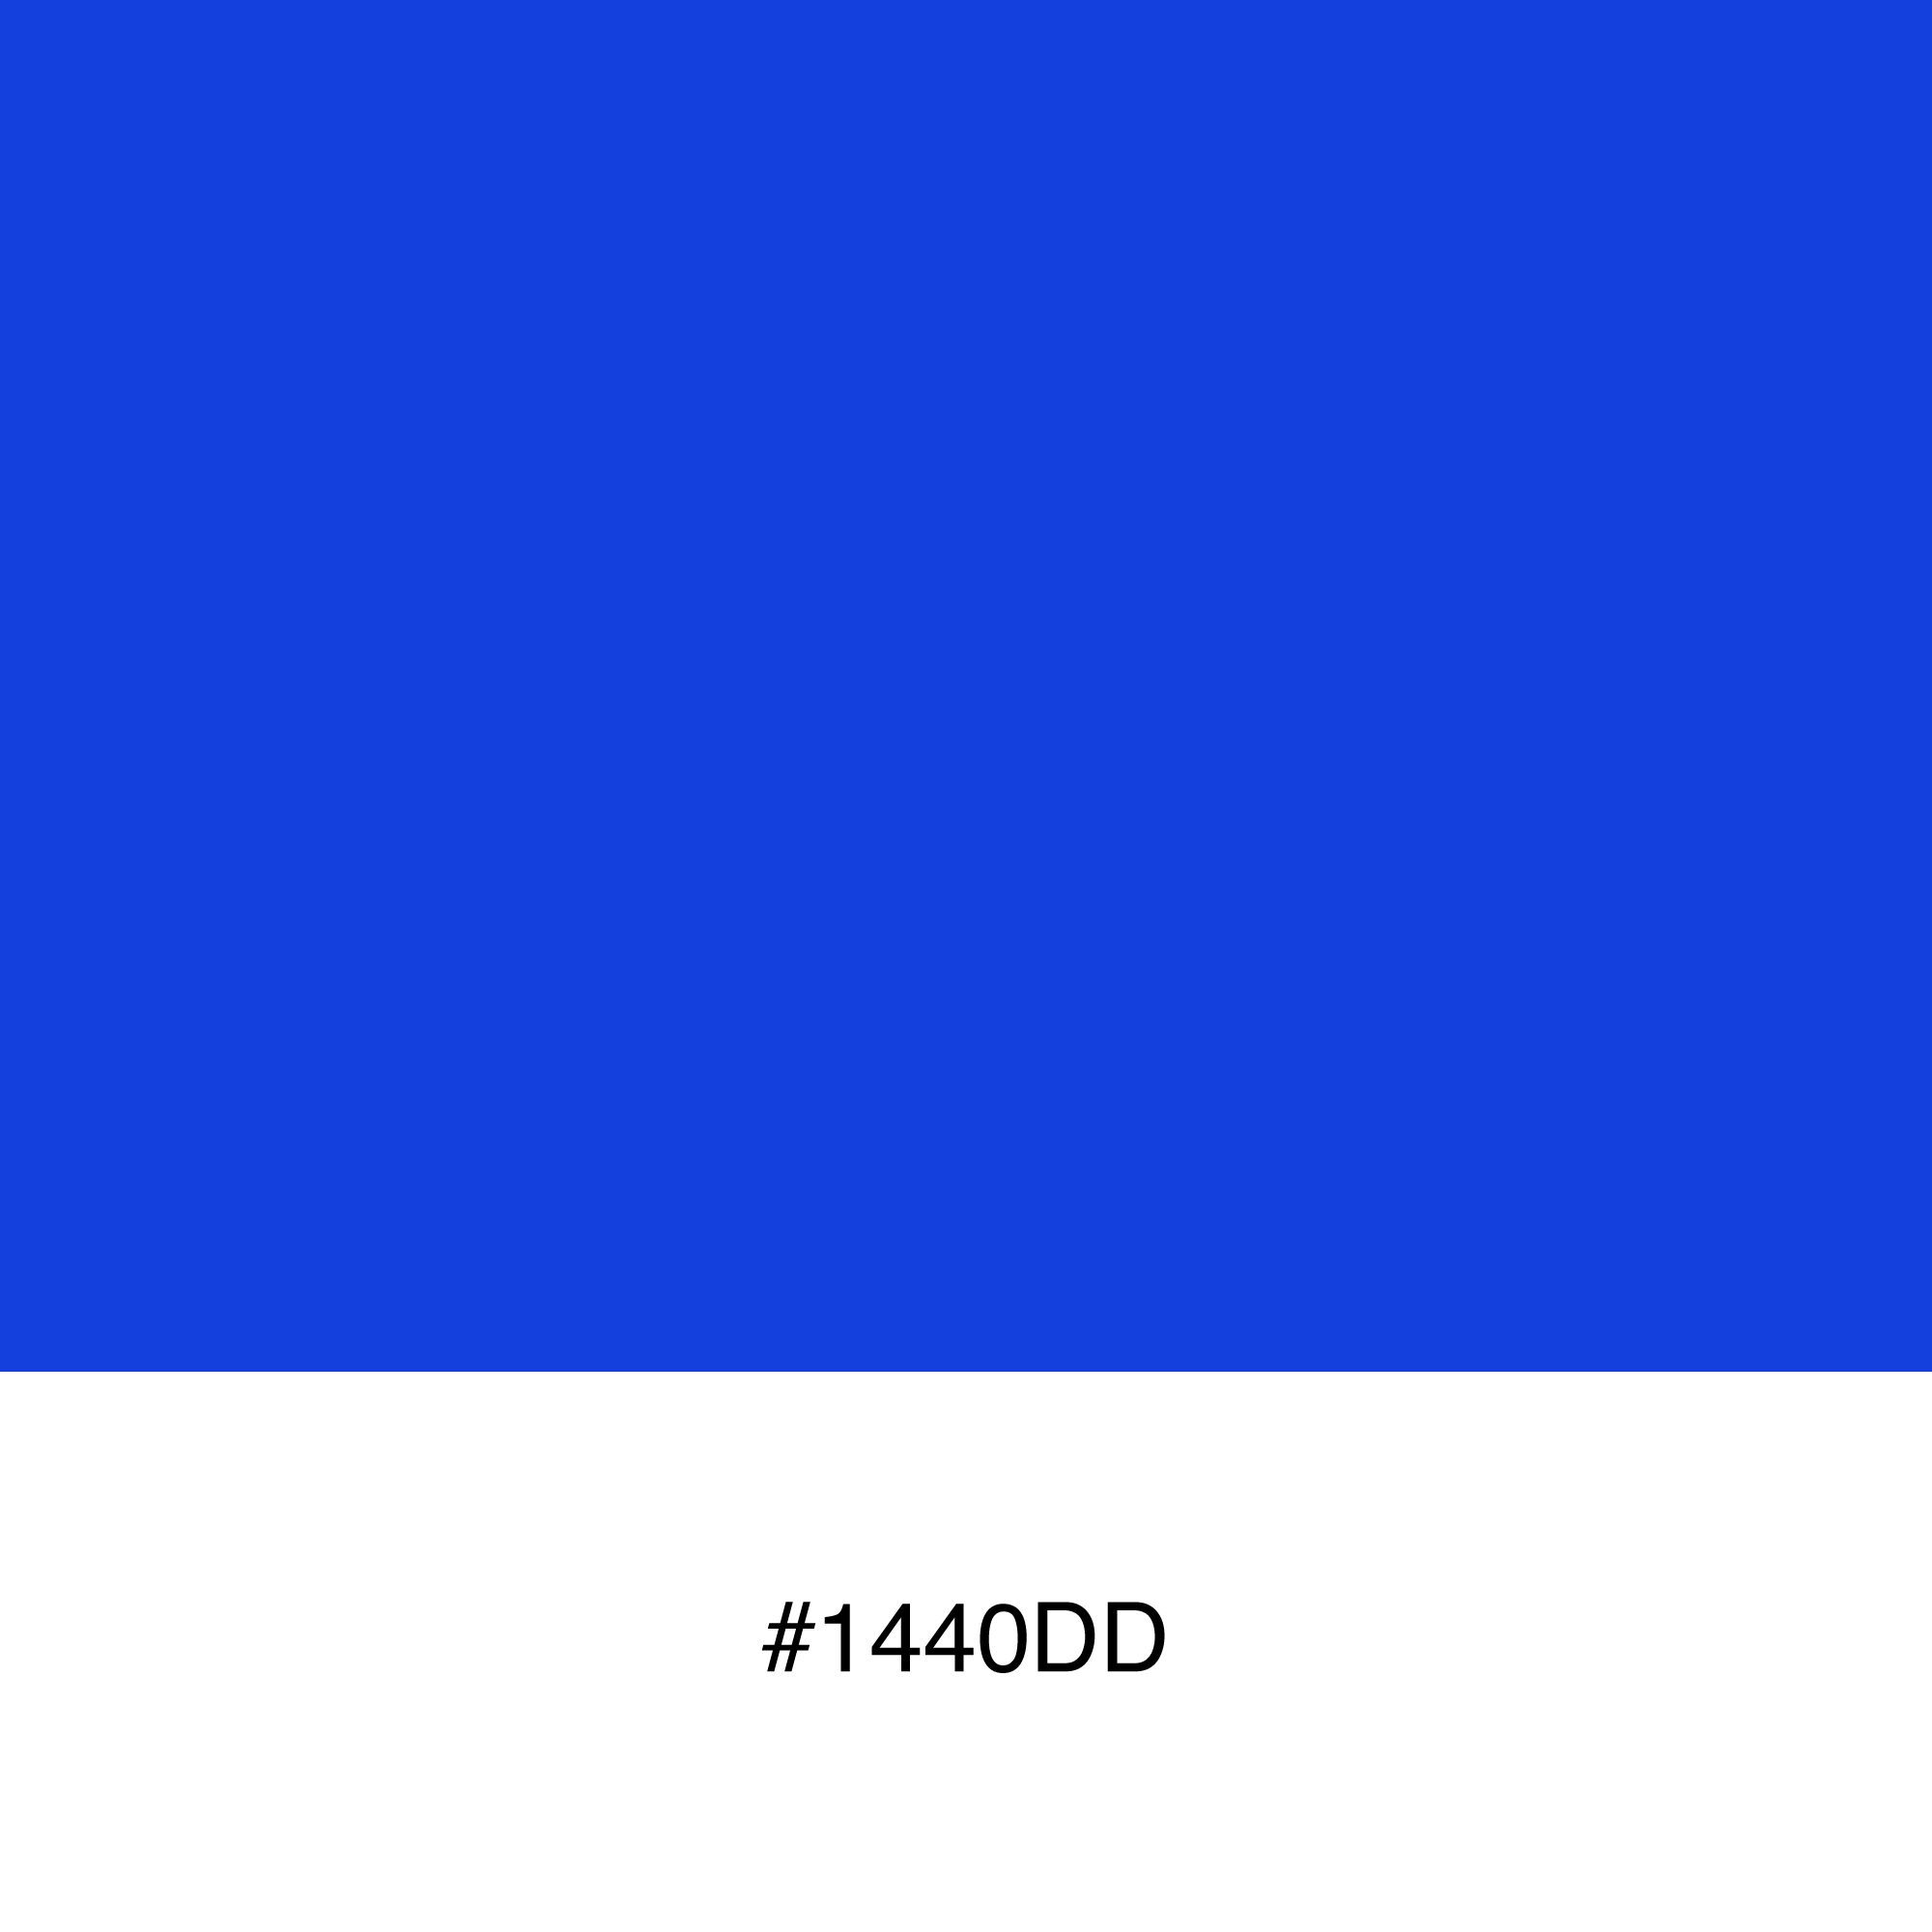 color-swatch-1440dd